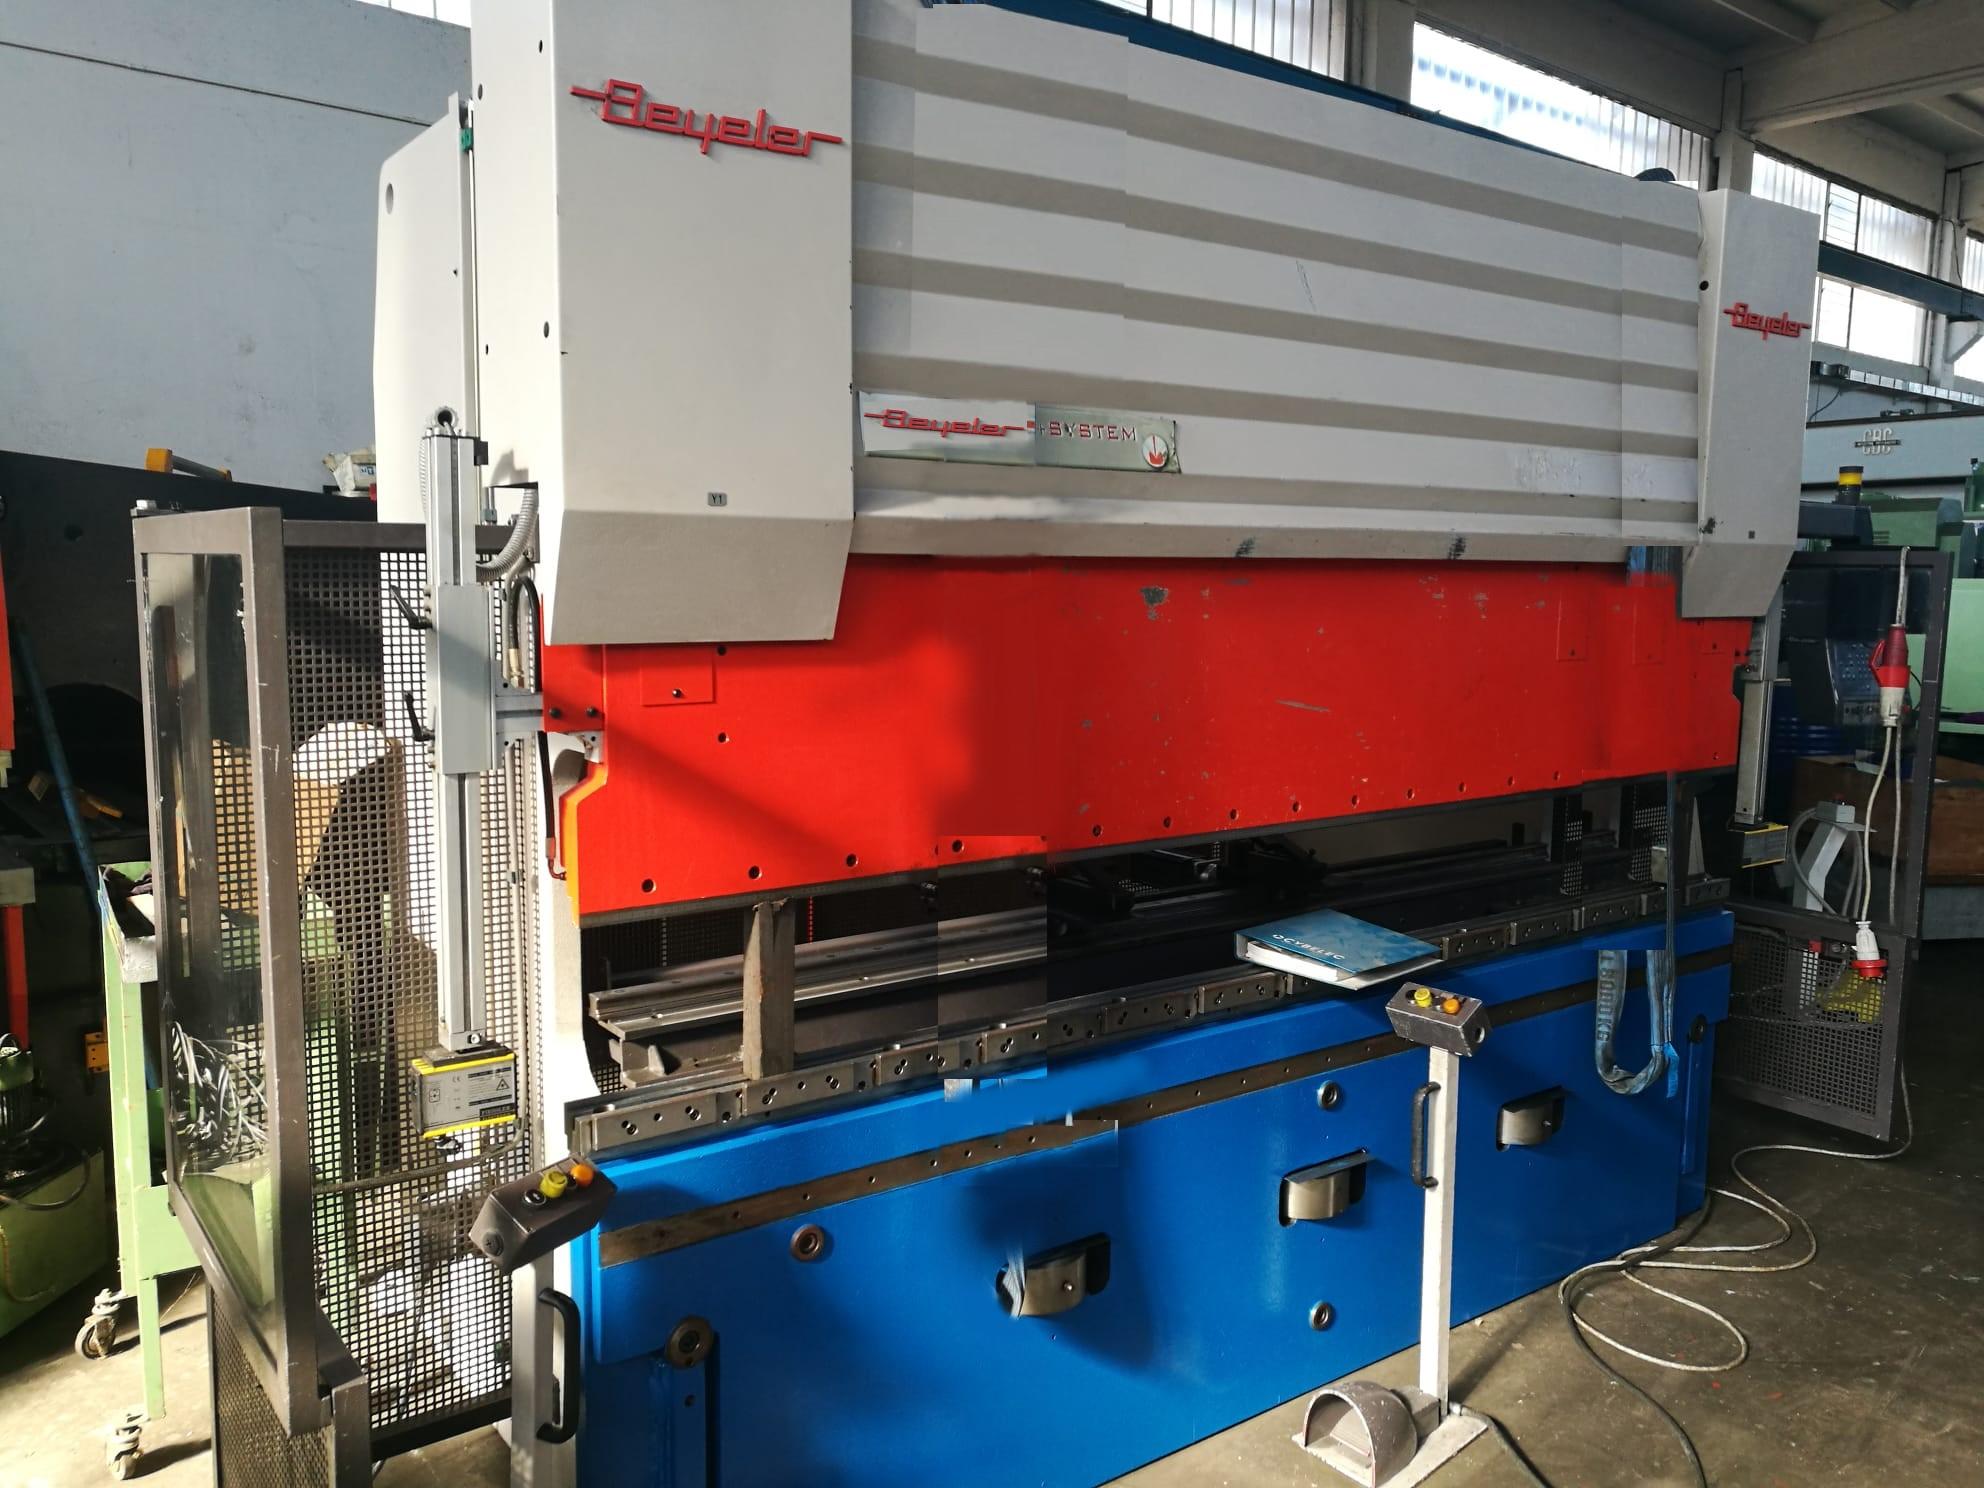 Piegatrice Beyeler pr 6 3100 mm x 100 ton 8 assi in vendita - foto 7